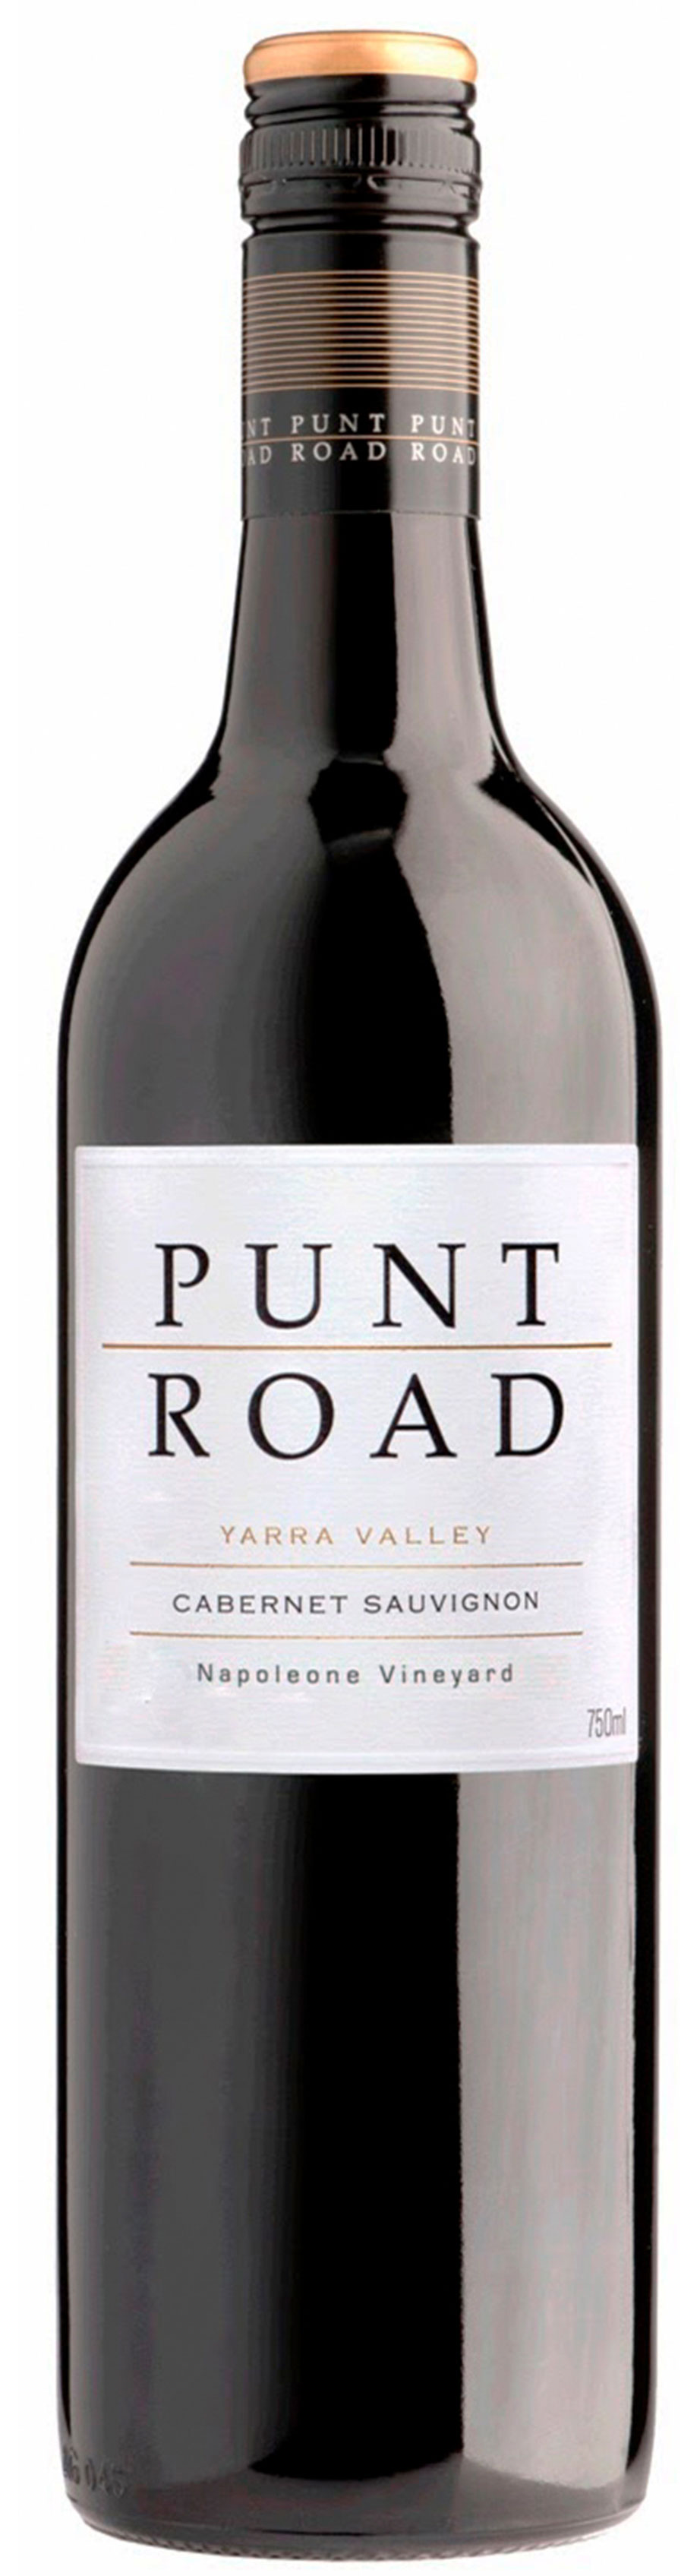 https://vinocorpperu.com/images/vinos/puntroad/punt_road_cabernet_sauvignon_2016.jpg